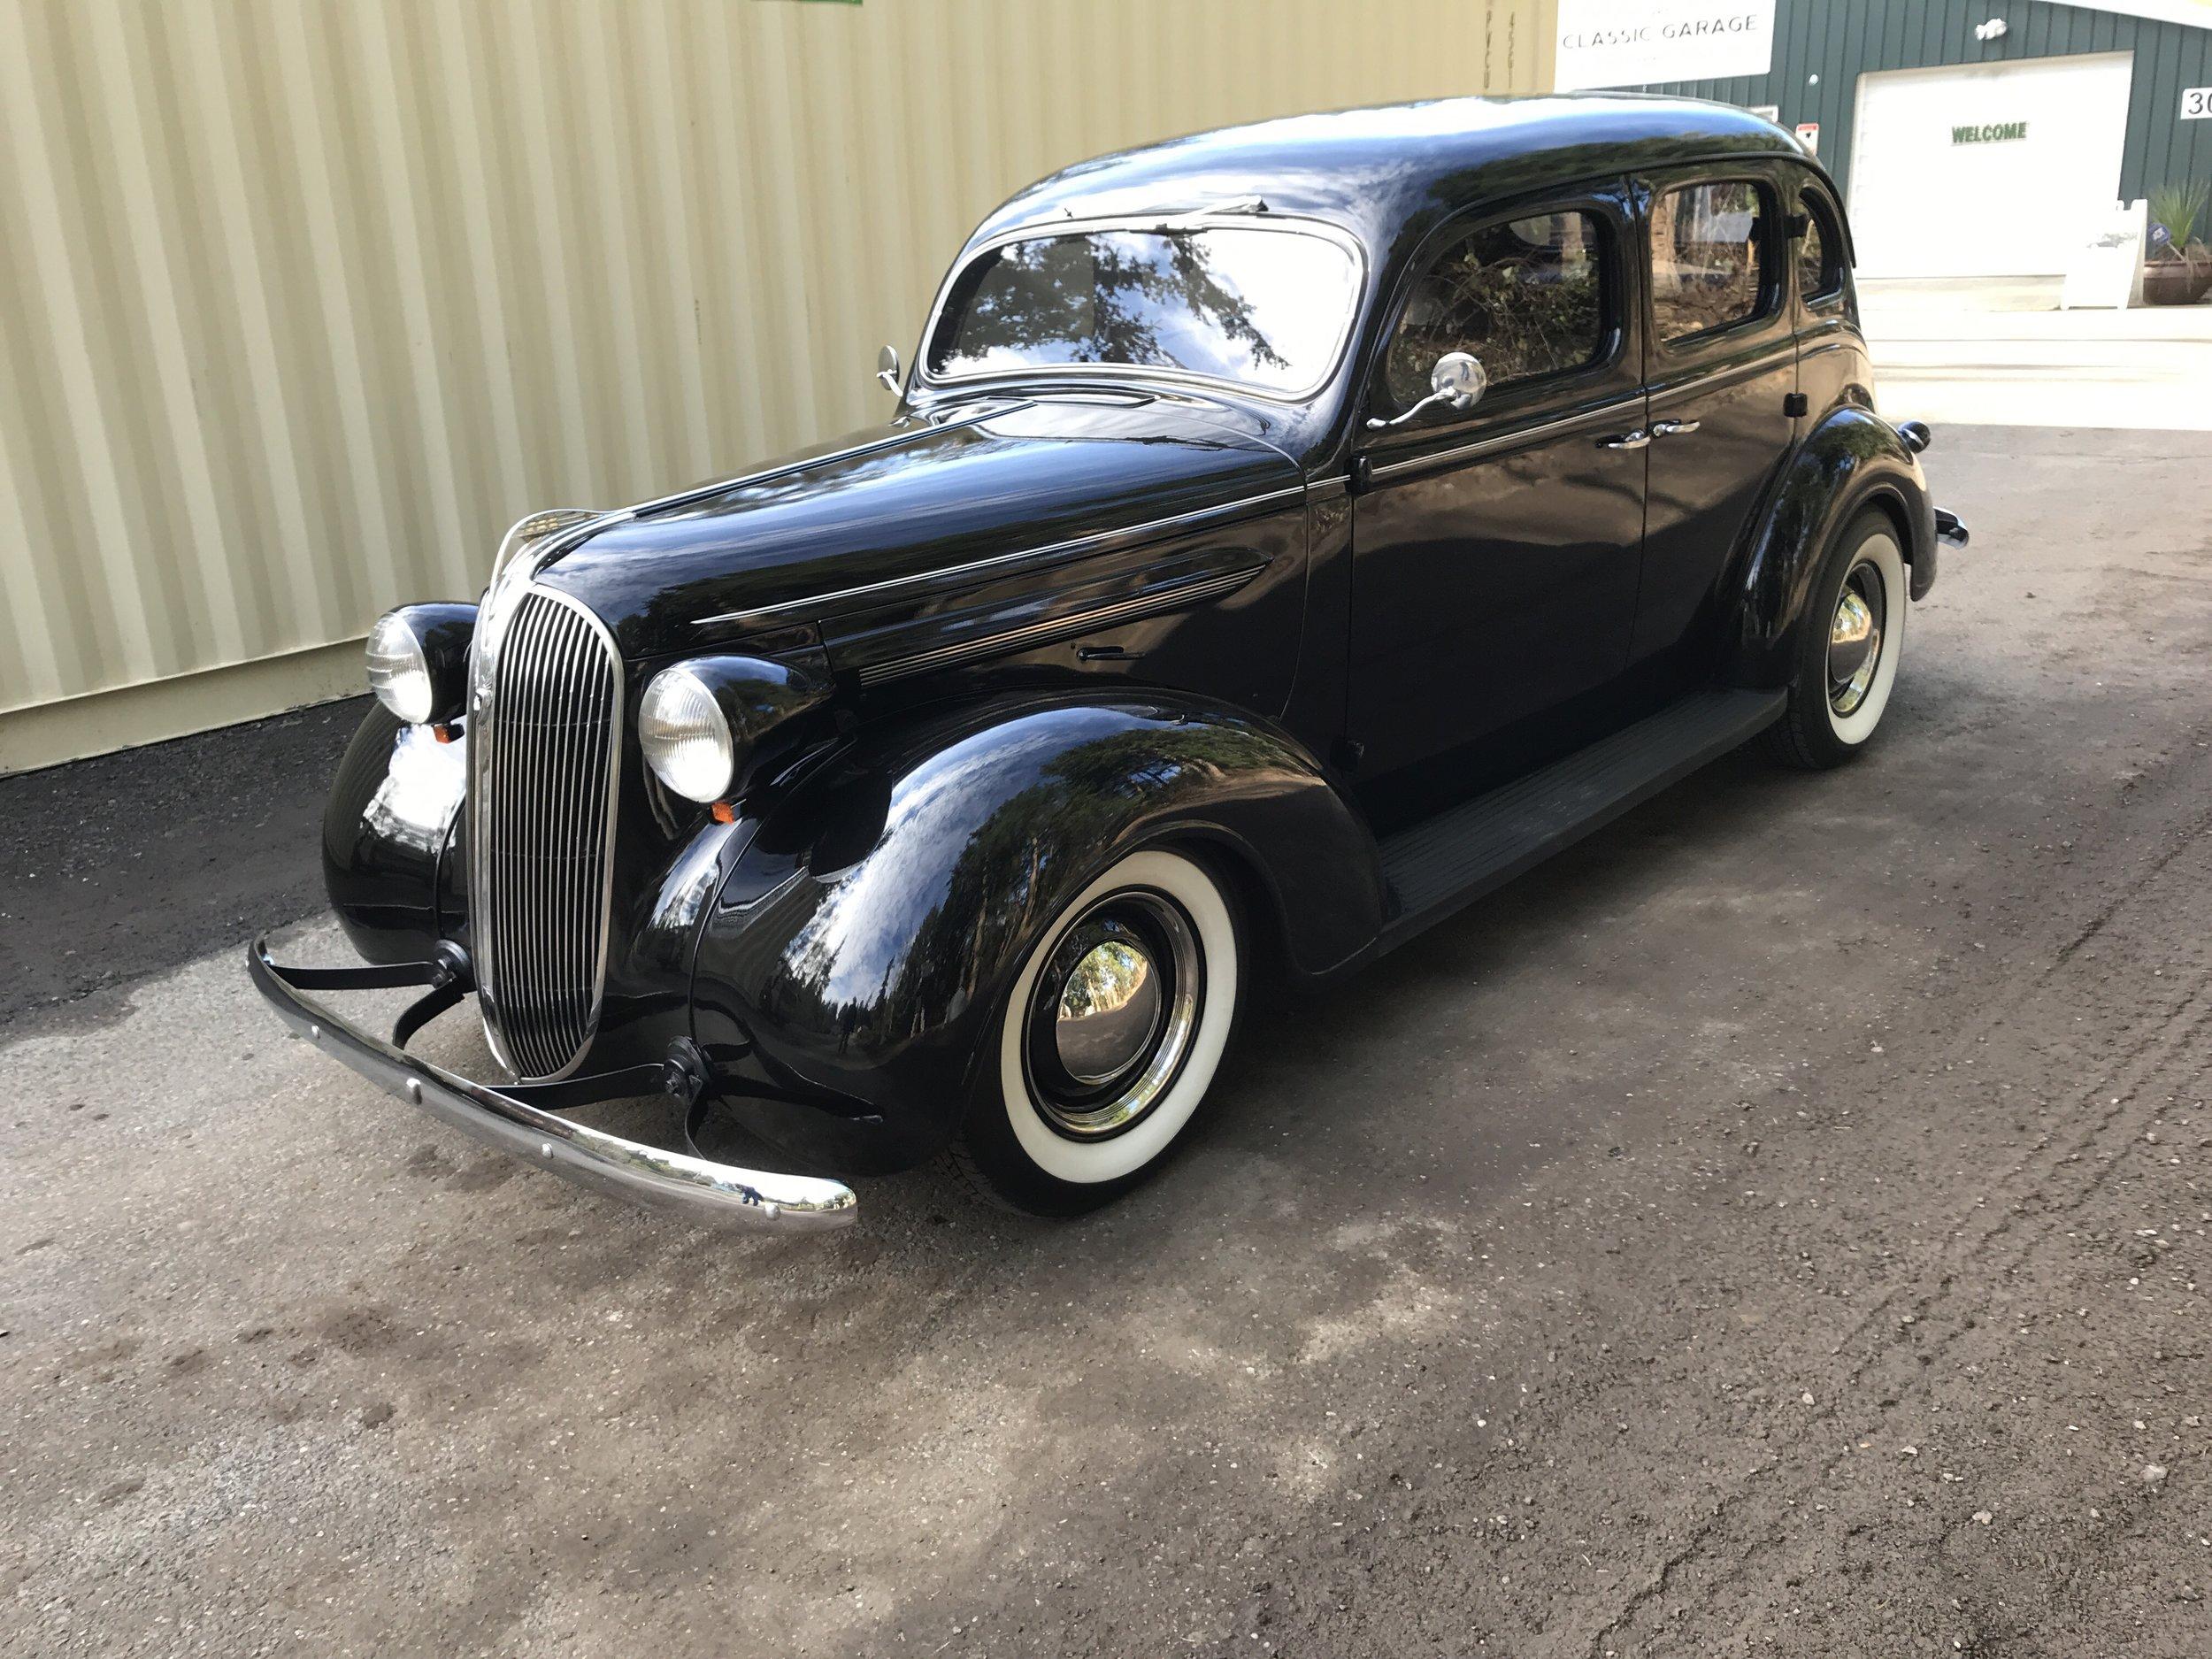 1937 Plymouth 4 dr sedan  $32,500